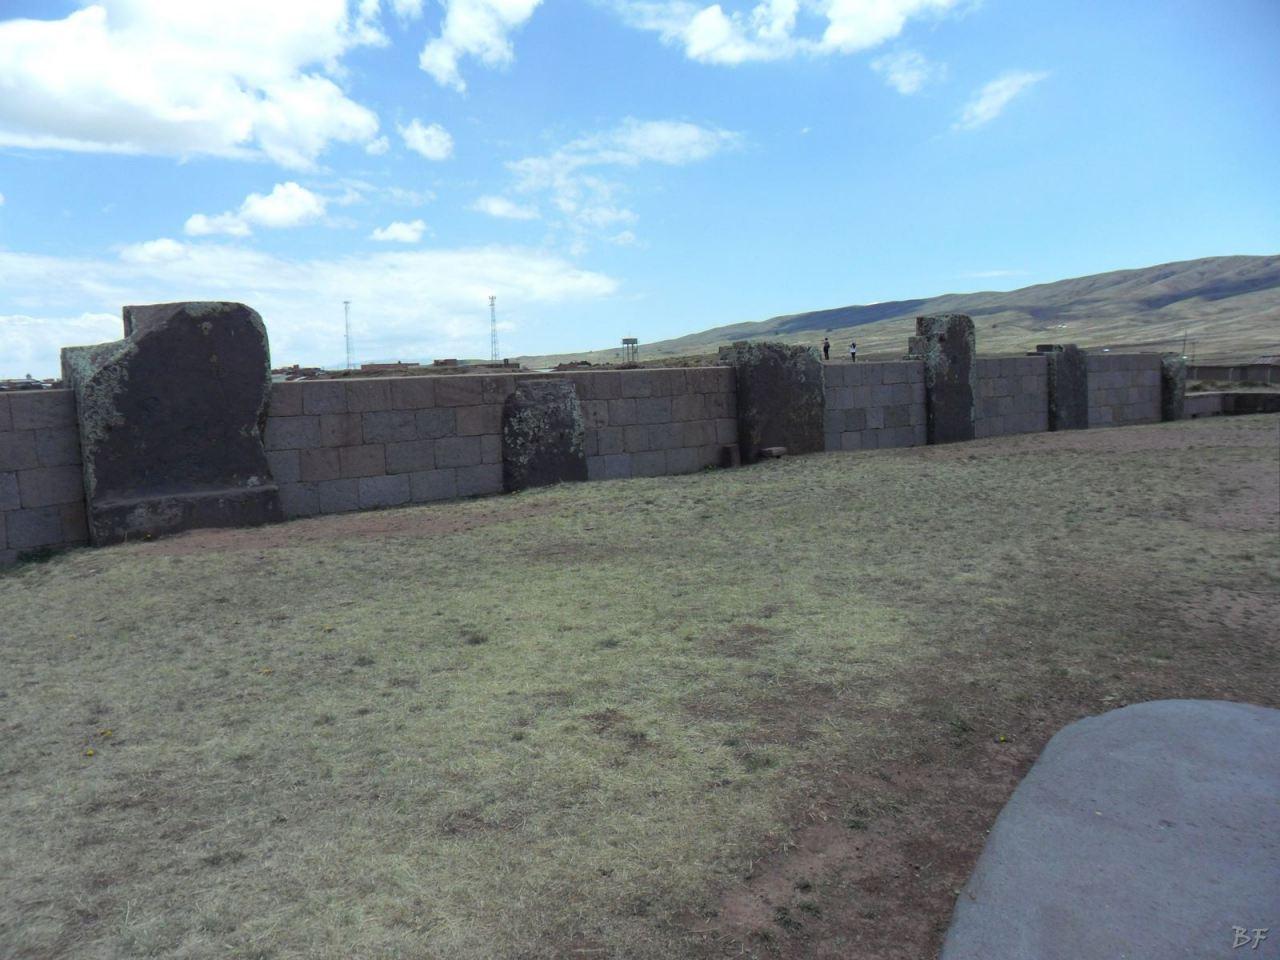 Sito-Megalitico-Piramide-Akapana-Kalasasaya-Menhir-Tiahuanaco-Bolivia-52